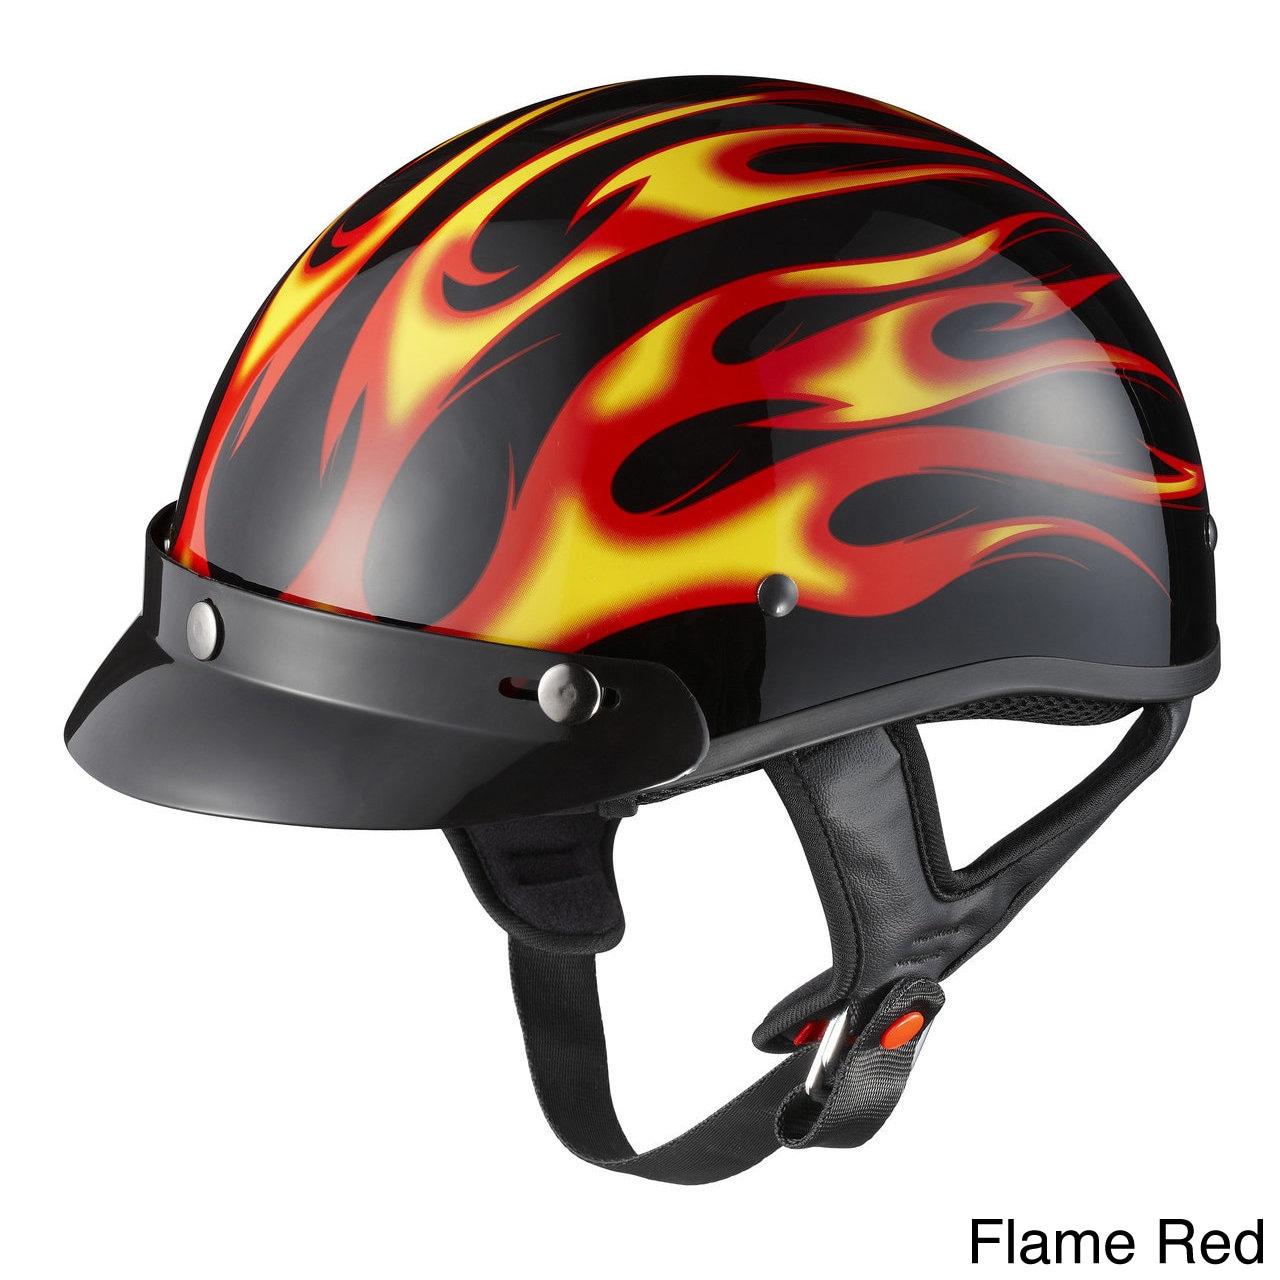 GLX Motorcycle Snap-on Visor Half Helmet (Flame Red, Small)